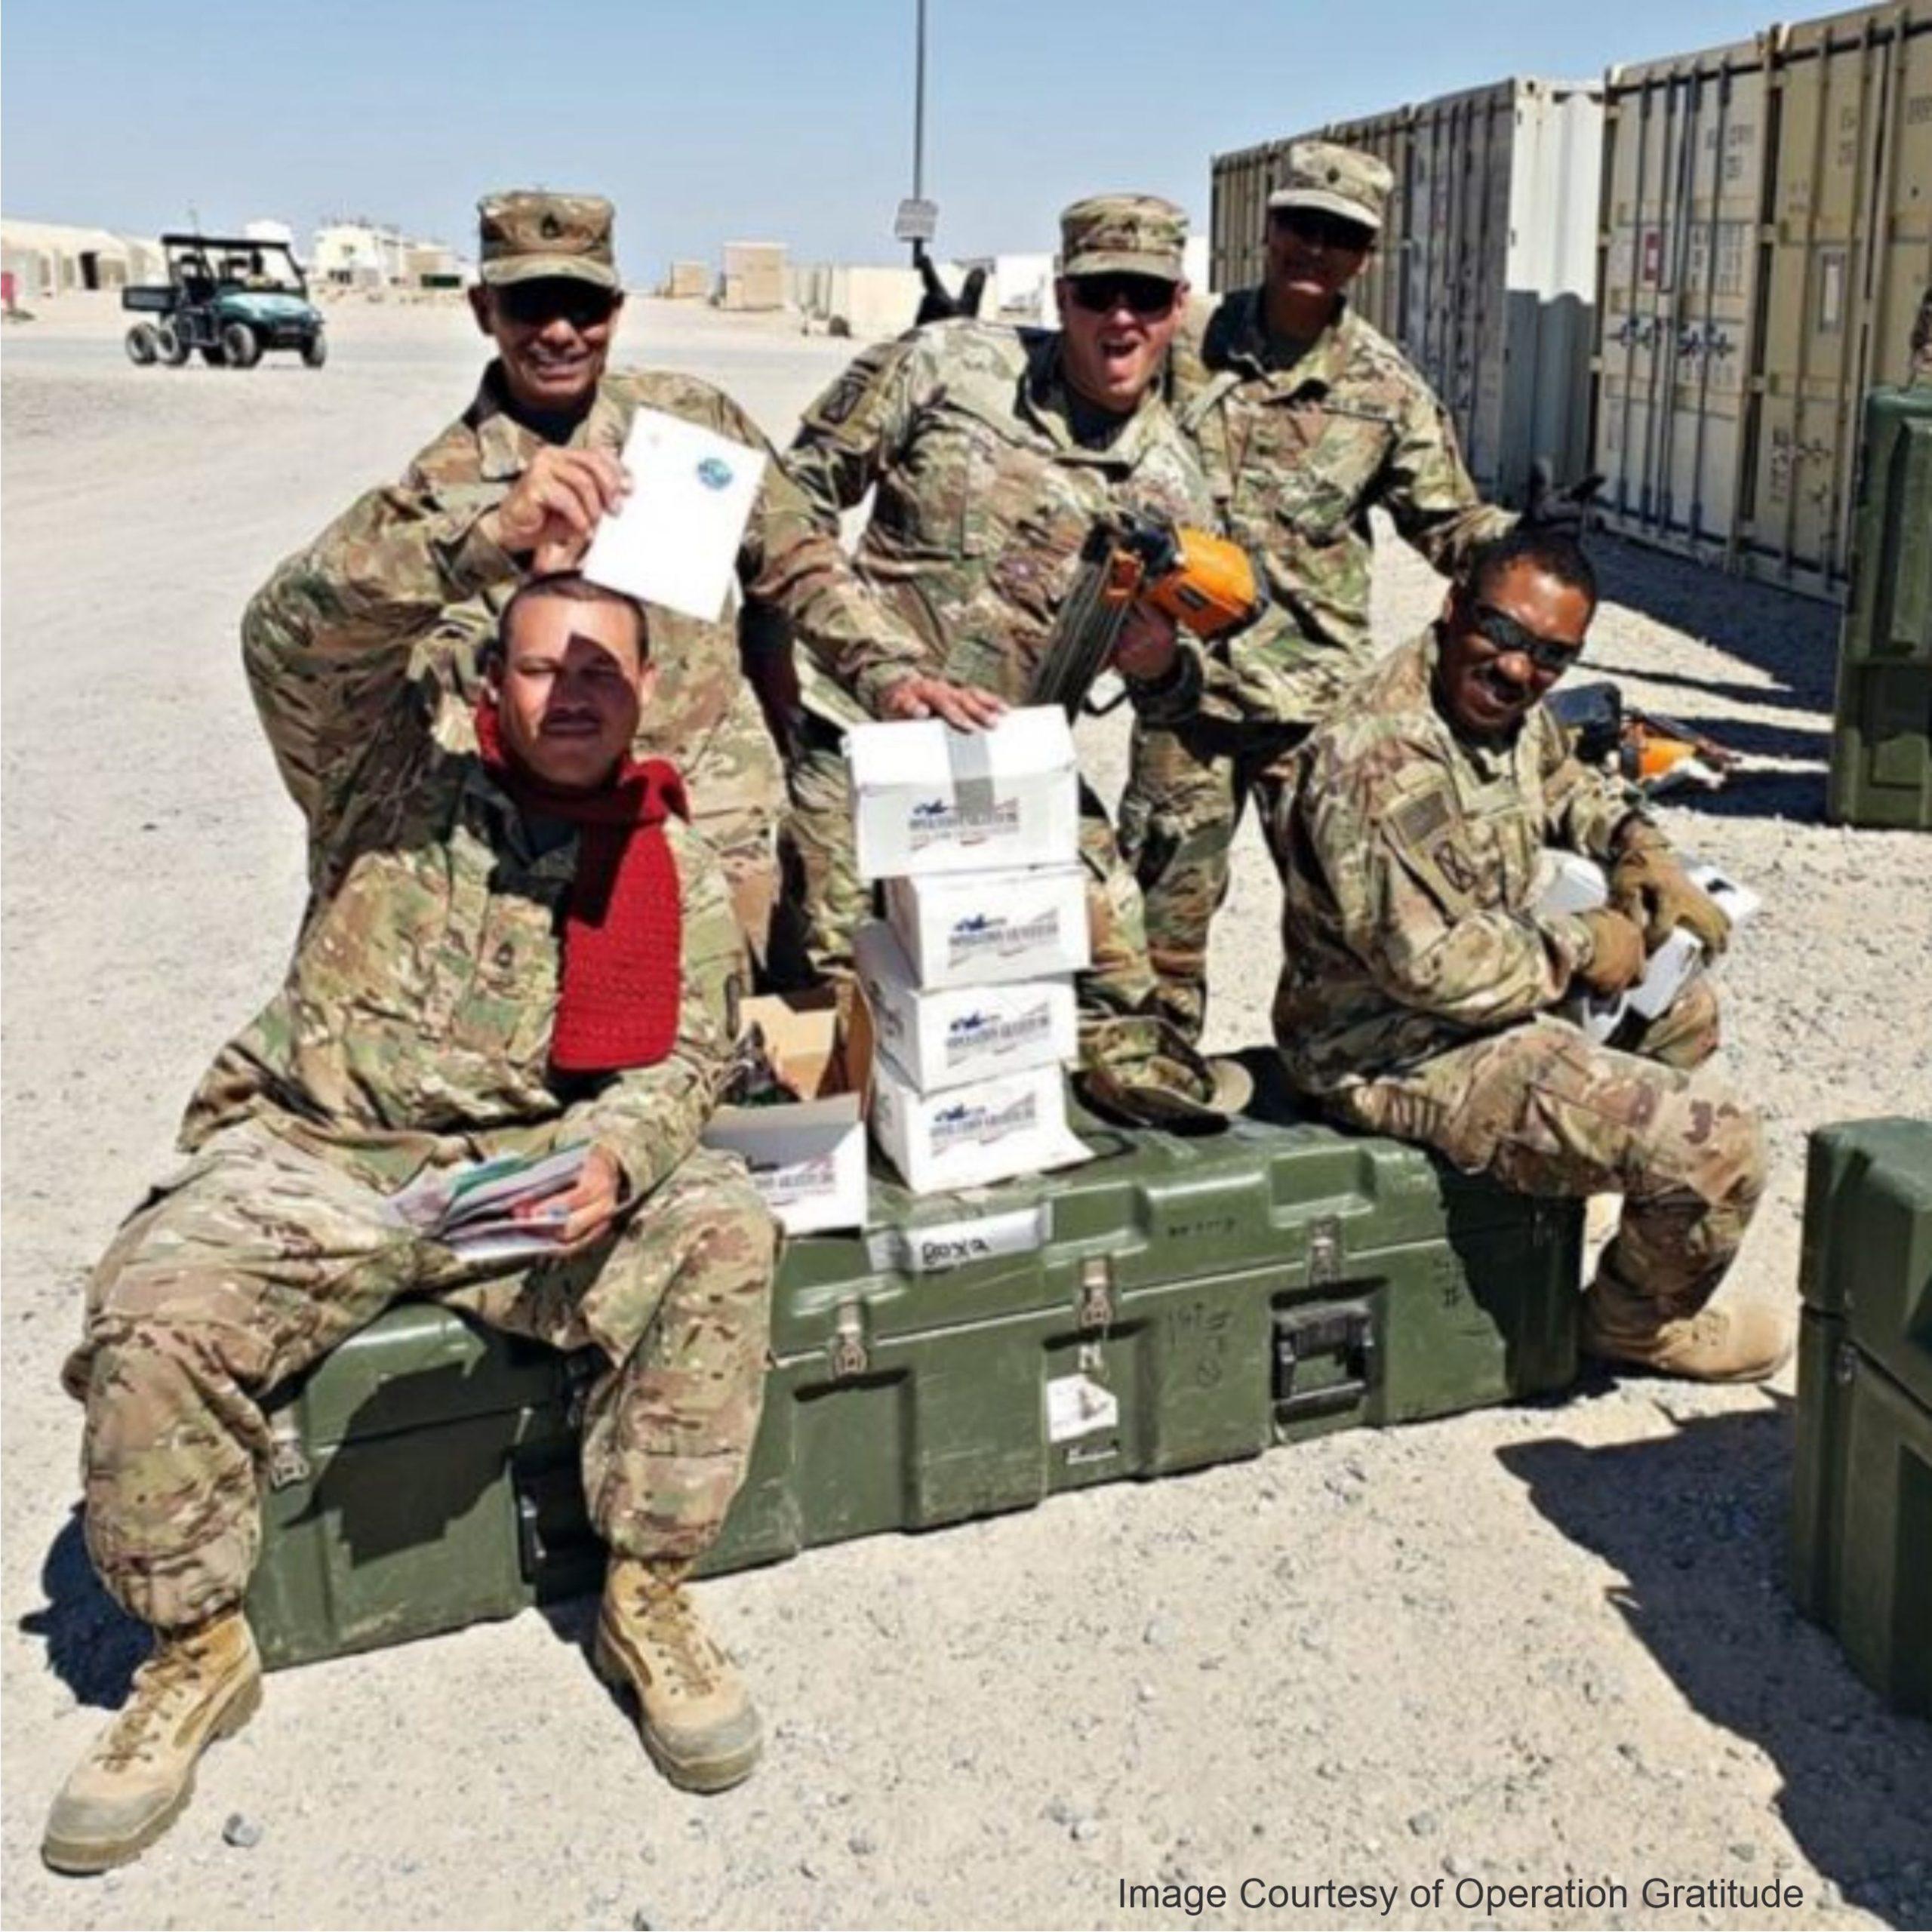 Where to send handmade items to the military